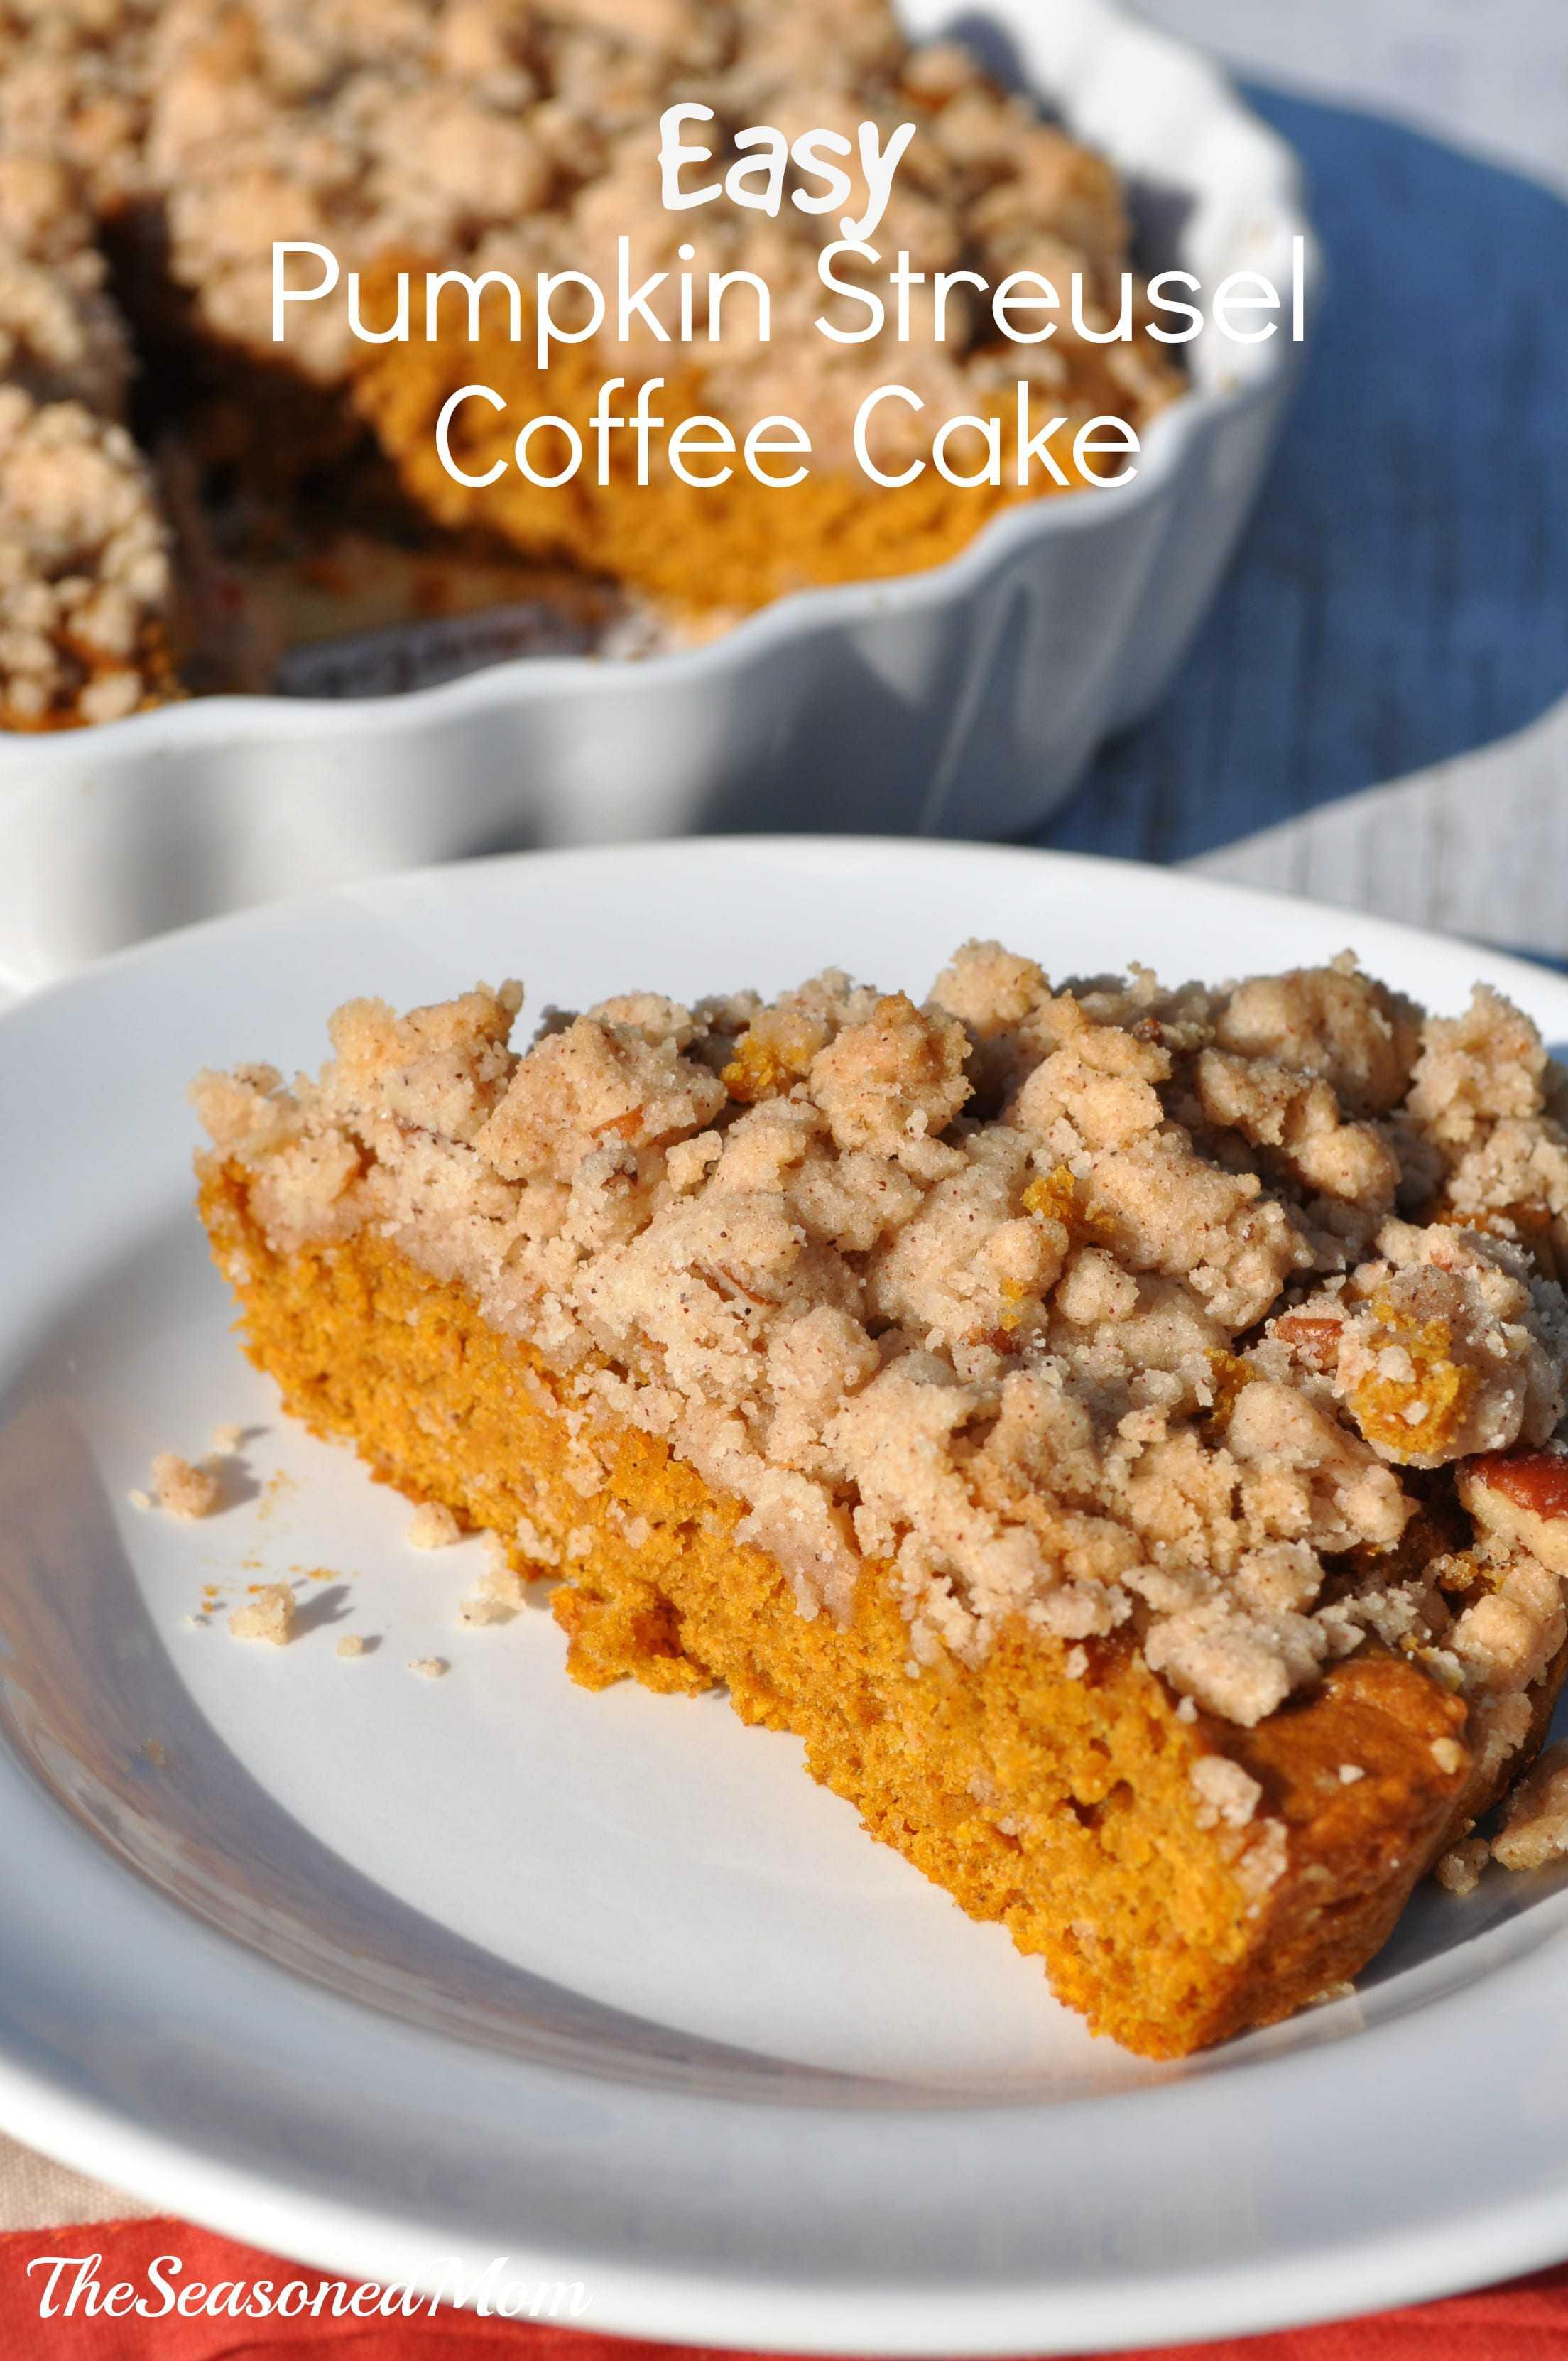 Apple Ricotta Coffee Cake Recipe